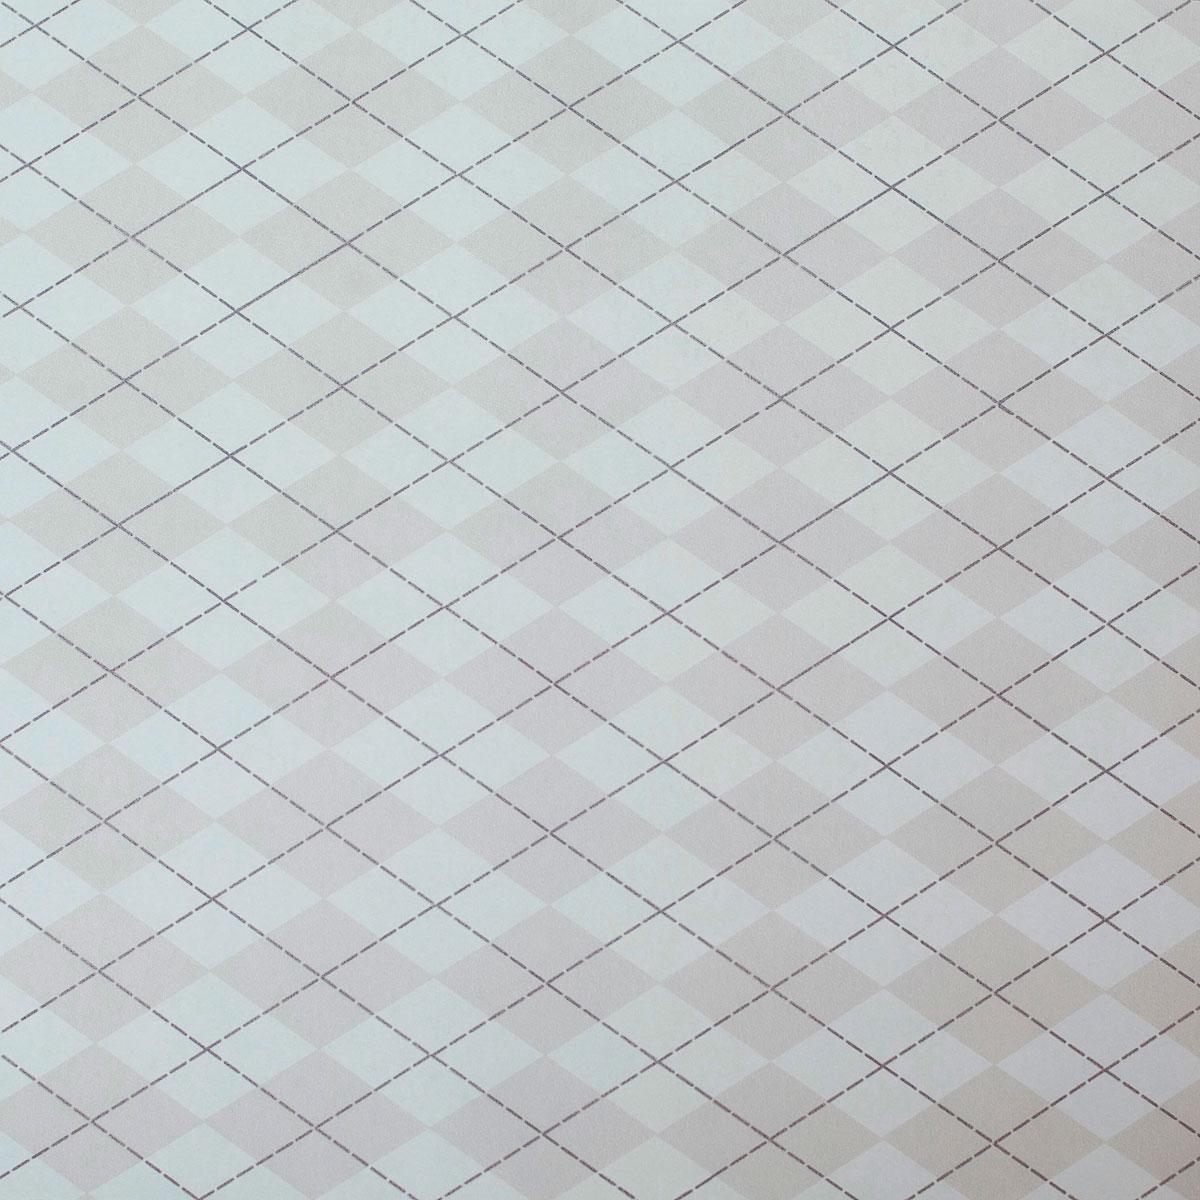 Оберточная бумага для цветов Ромб Лайт